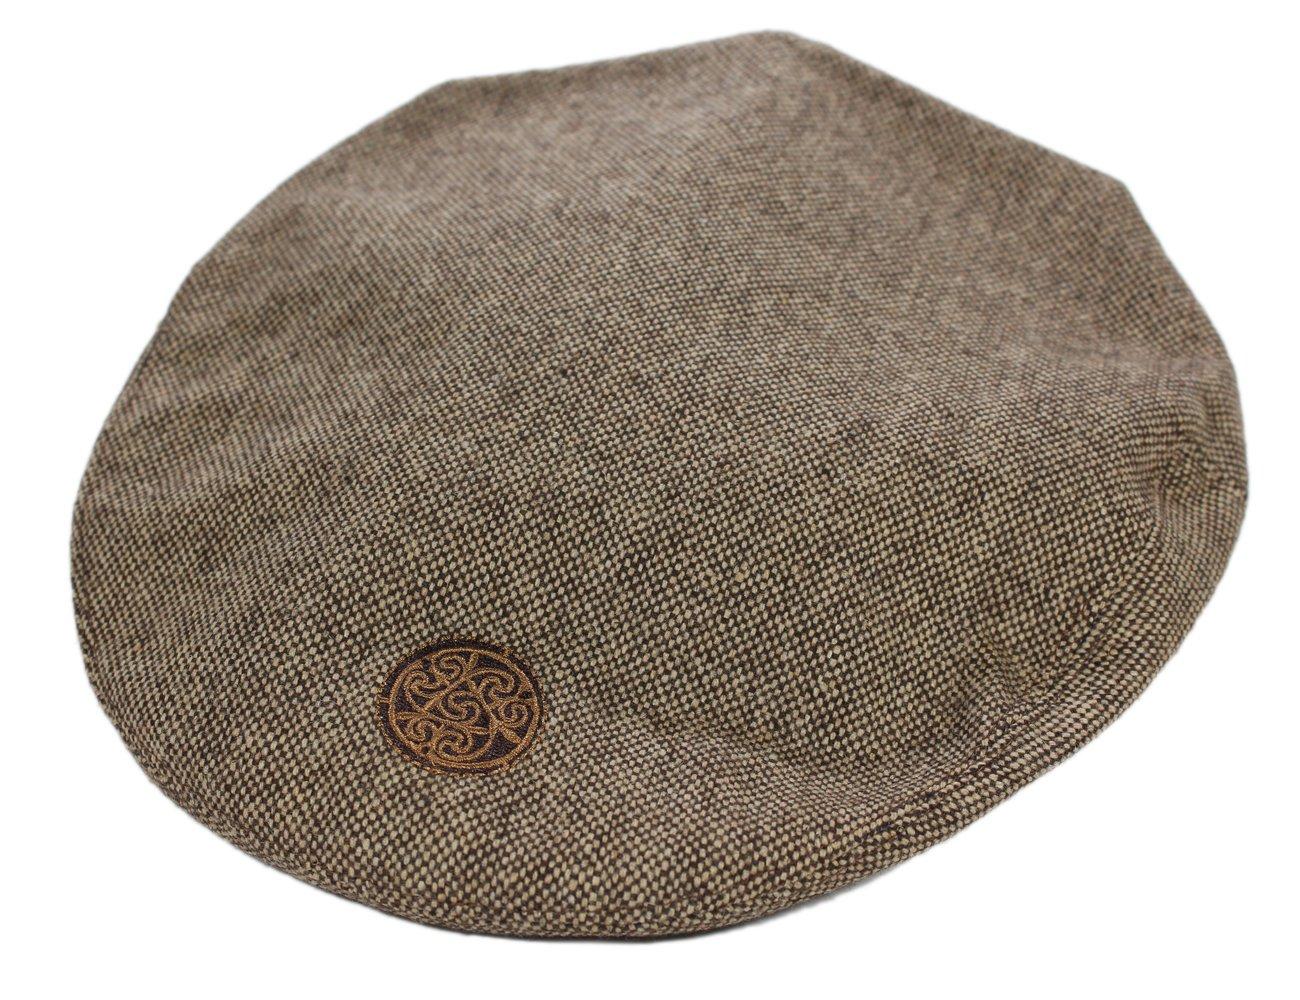 Patchwork Tweed Flat Cap Celtic Knot Badge Patrick Francis